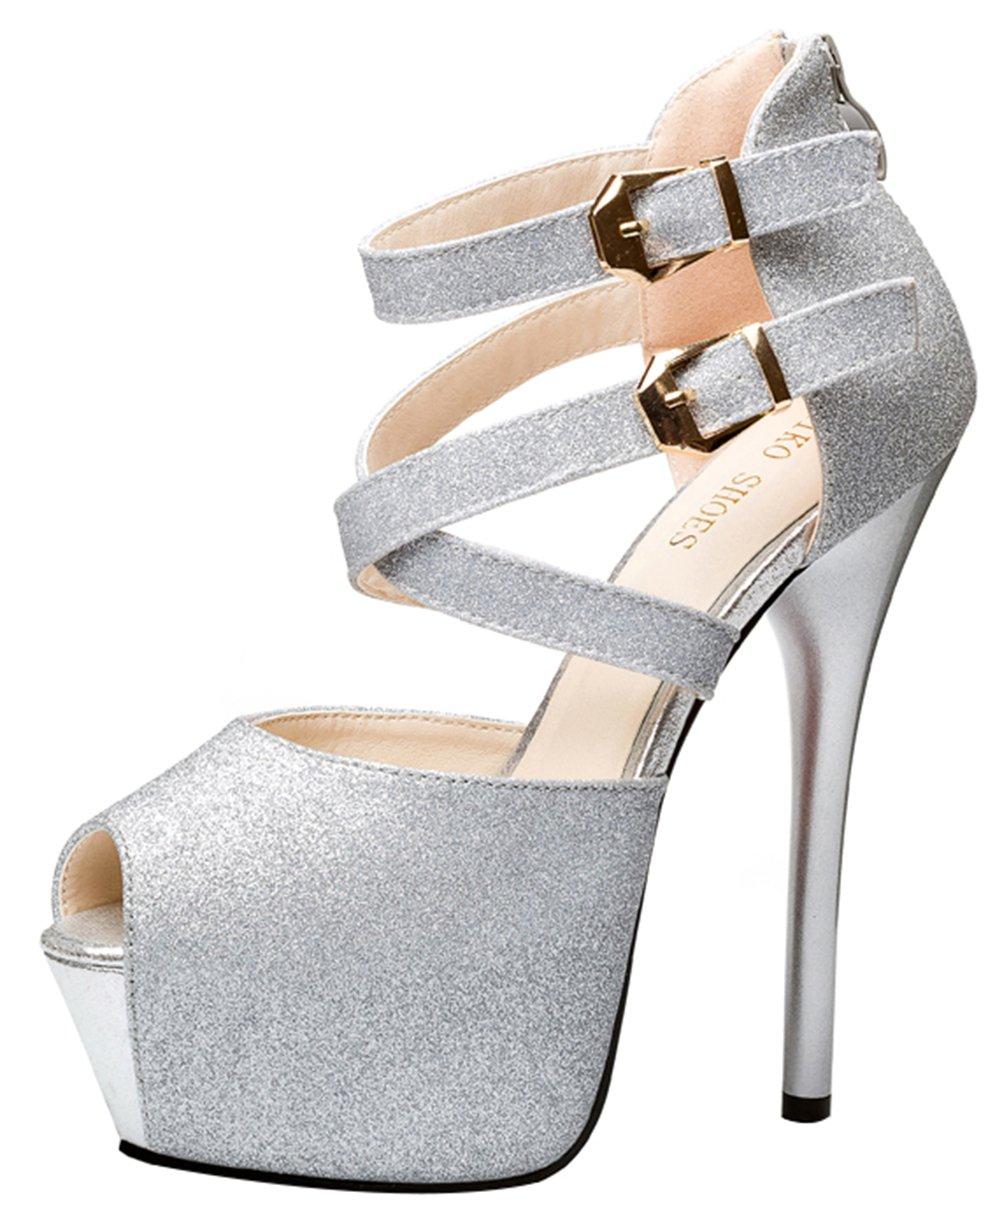 T&Mates Womens Summer Peep Toe Platform Back Zip Strap Buckle Extreme High Heel Pumps Sandals (7.5 B(M) US,Silver)